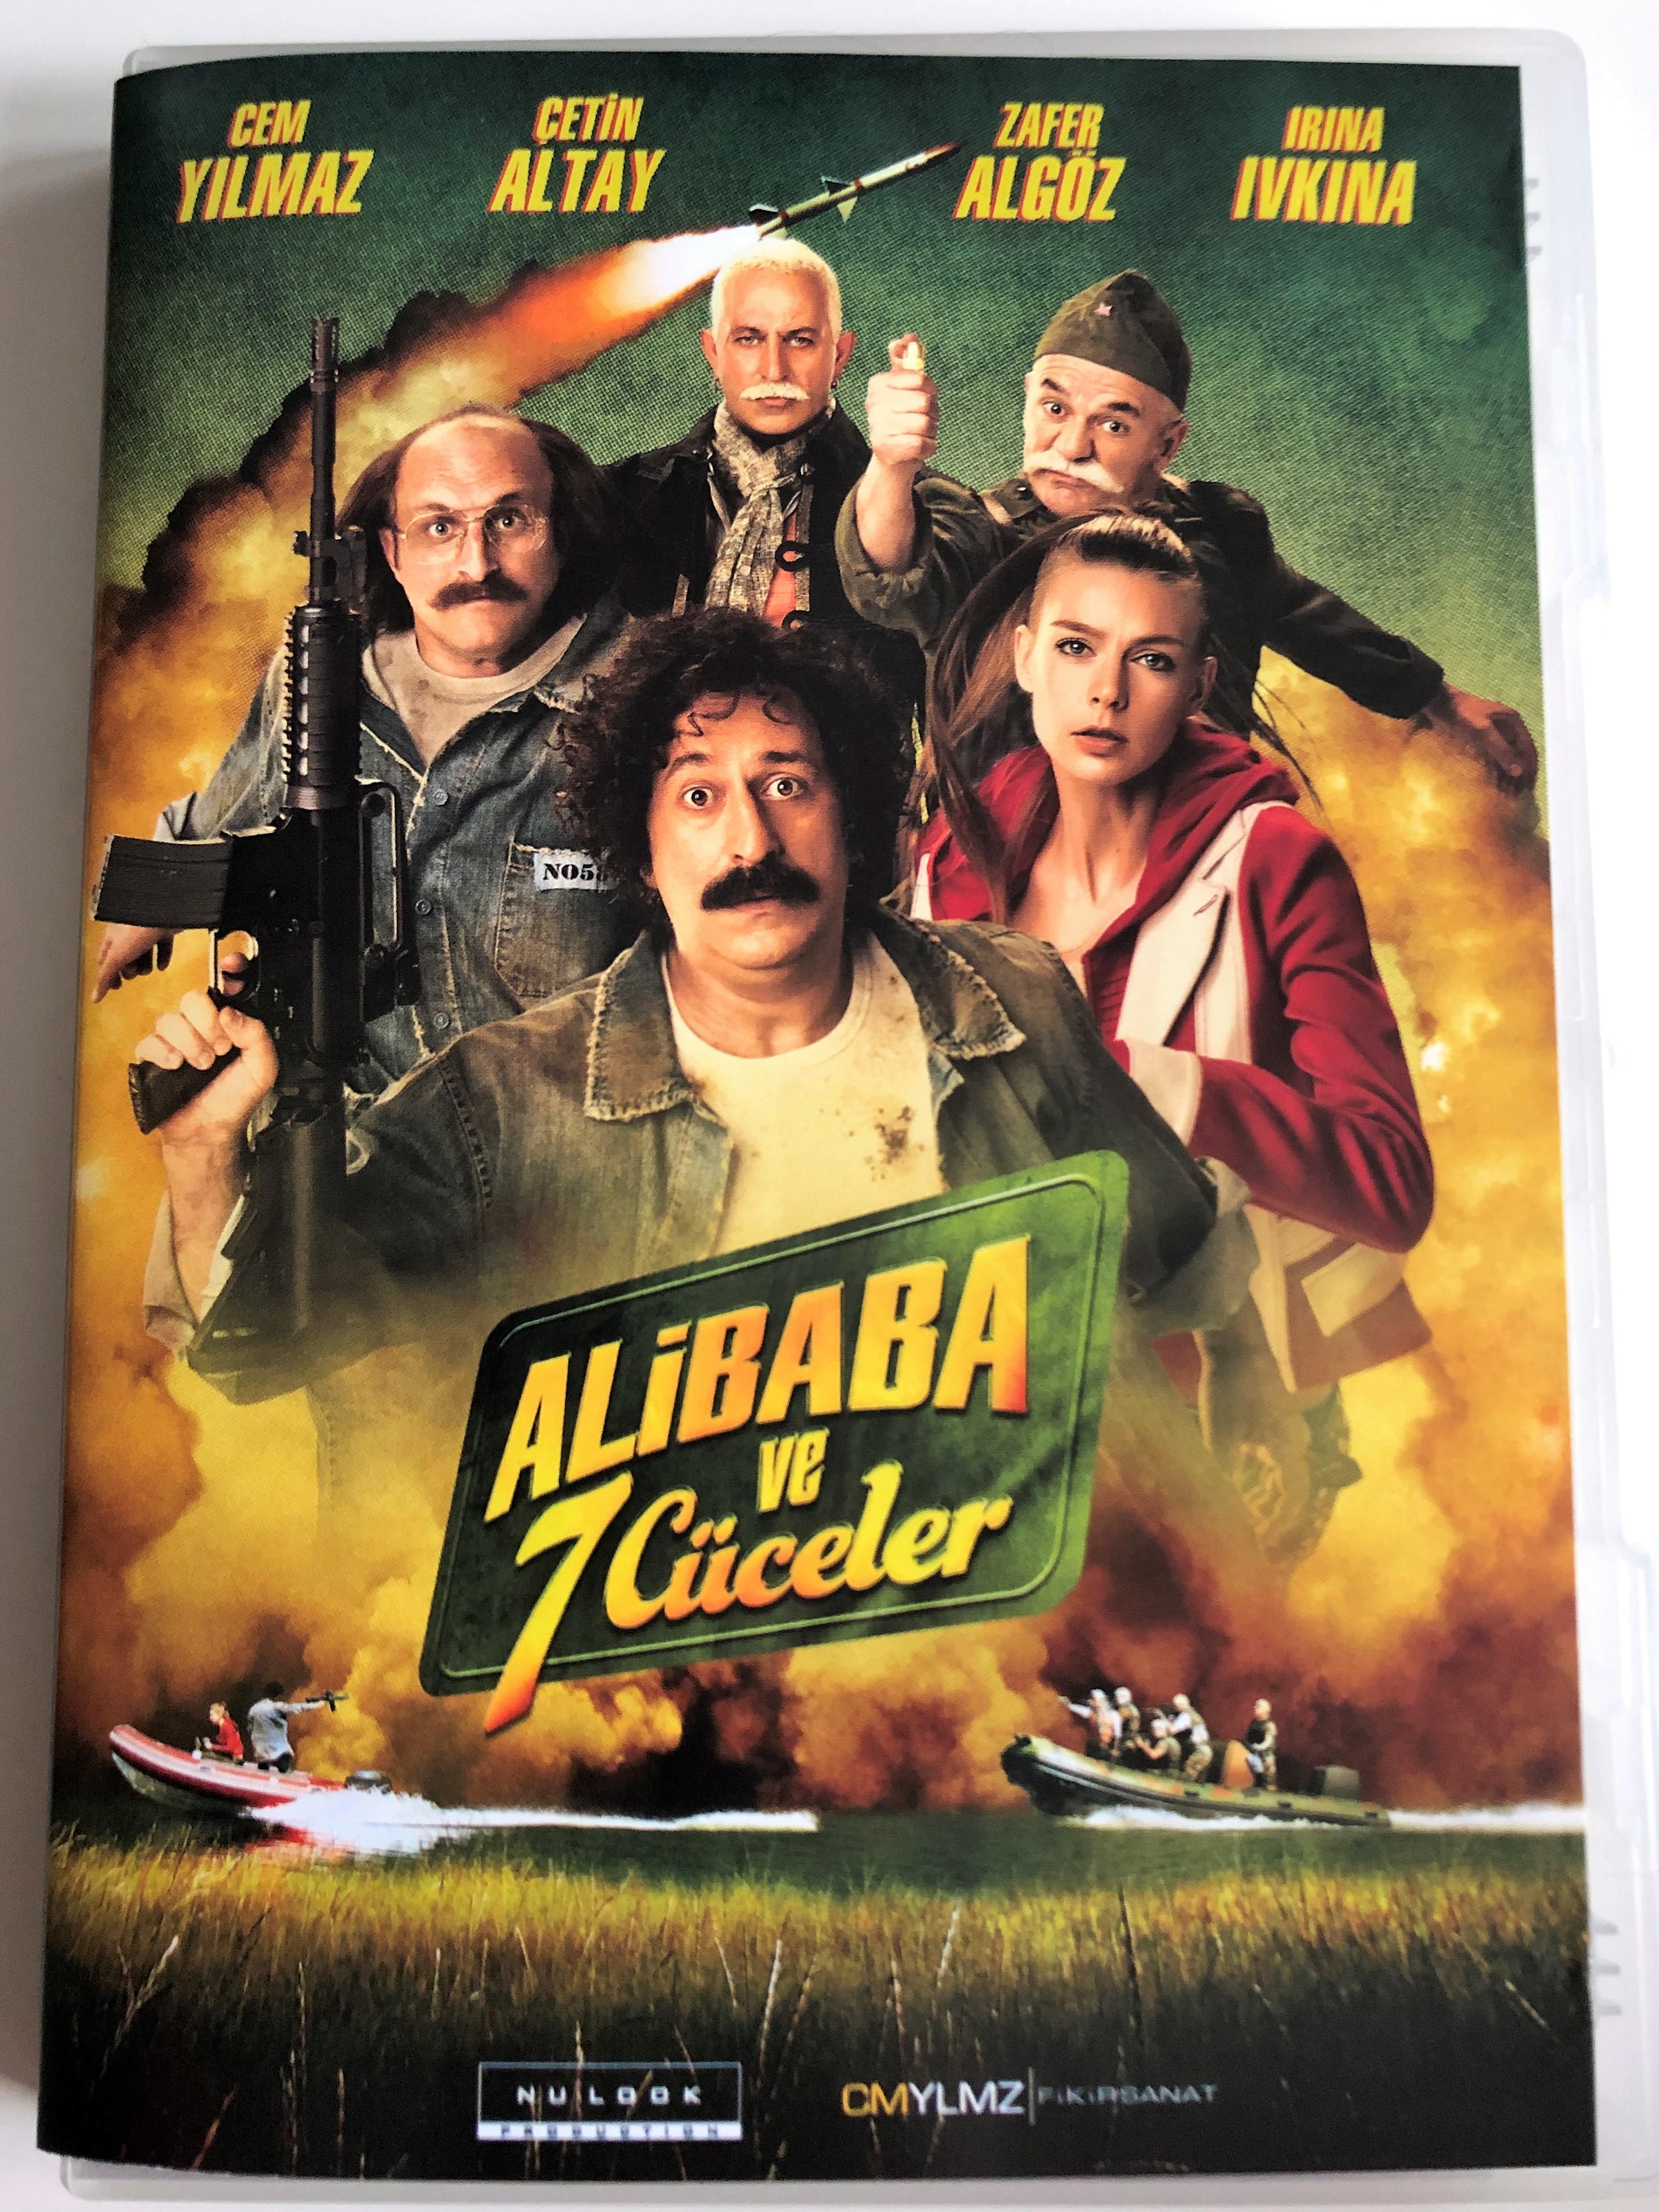 ali-baba-ve-7-c-celer-dvd-1-.jpg